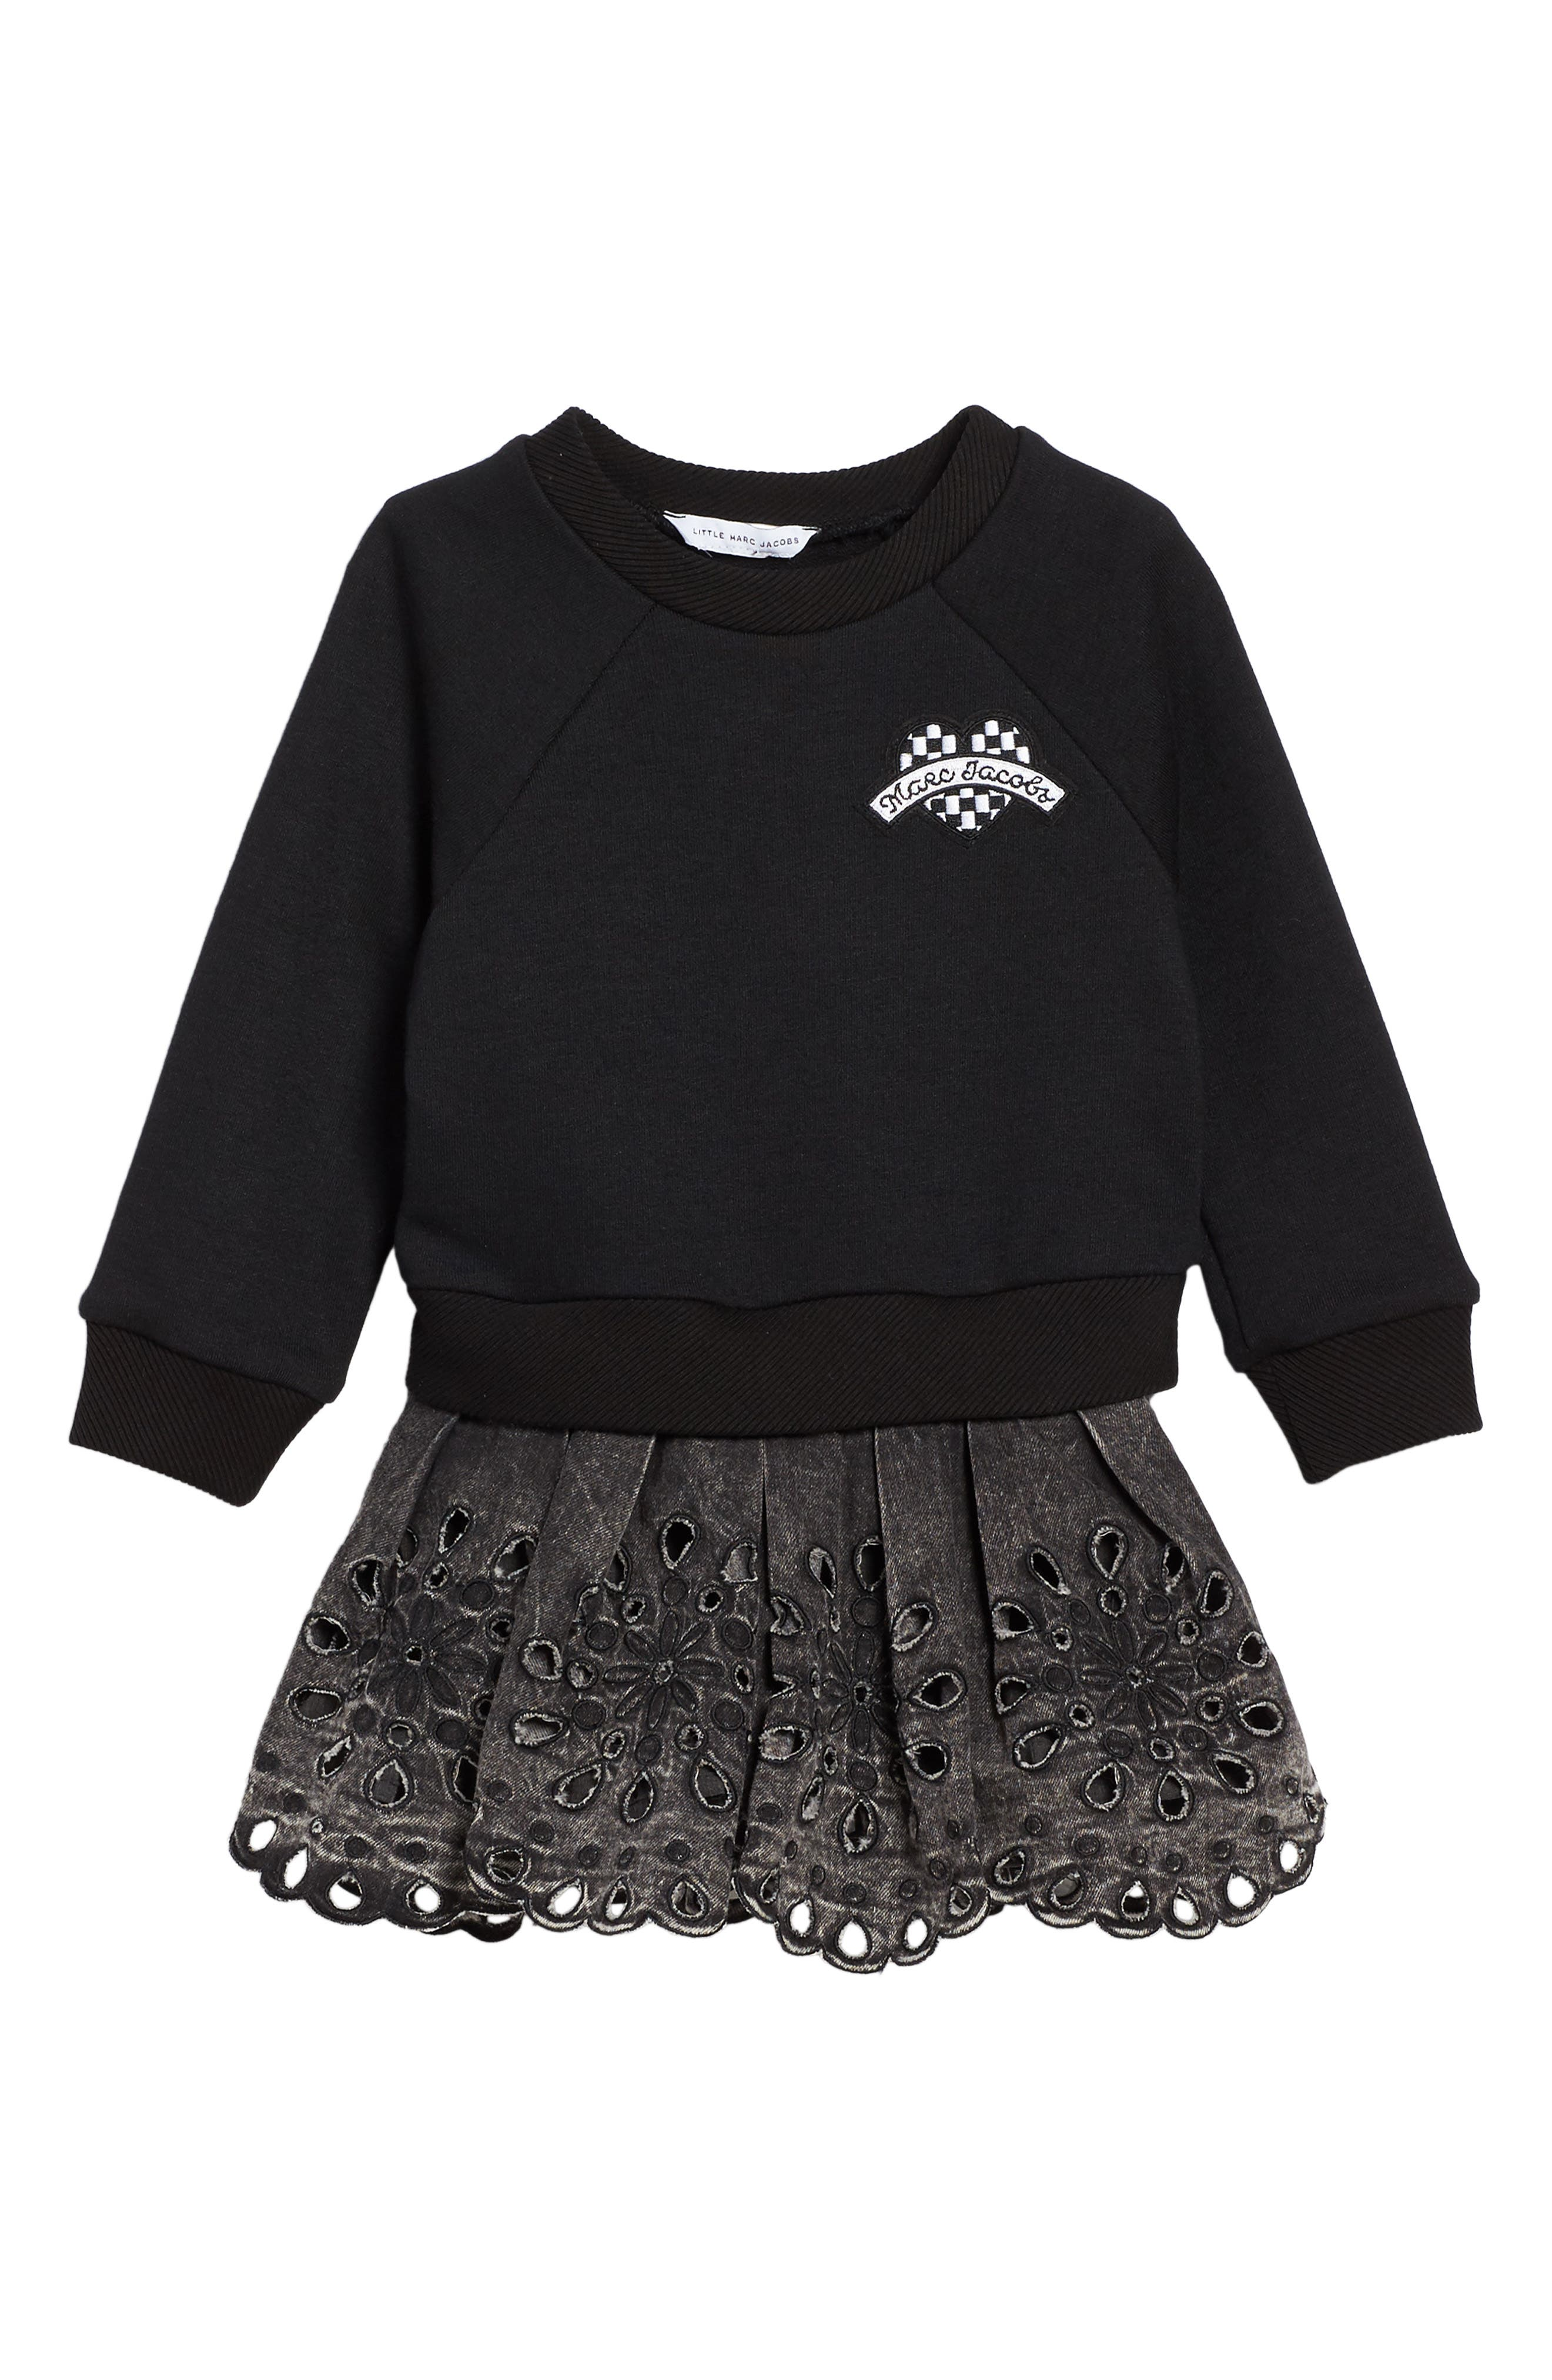 Sweatshirt & Skirt Set,                             Alternate thumbnail 2, color,                             Black